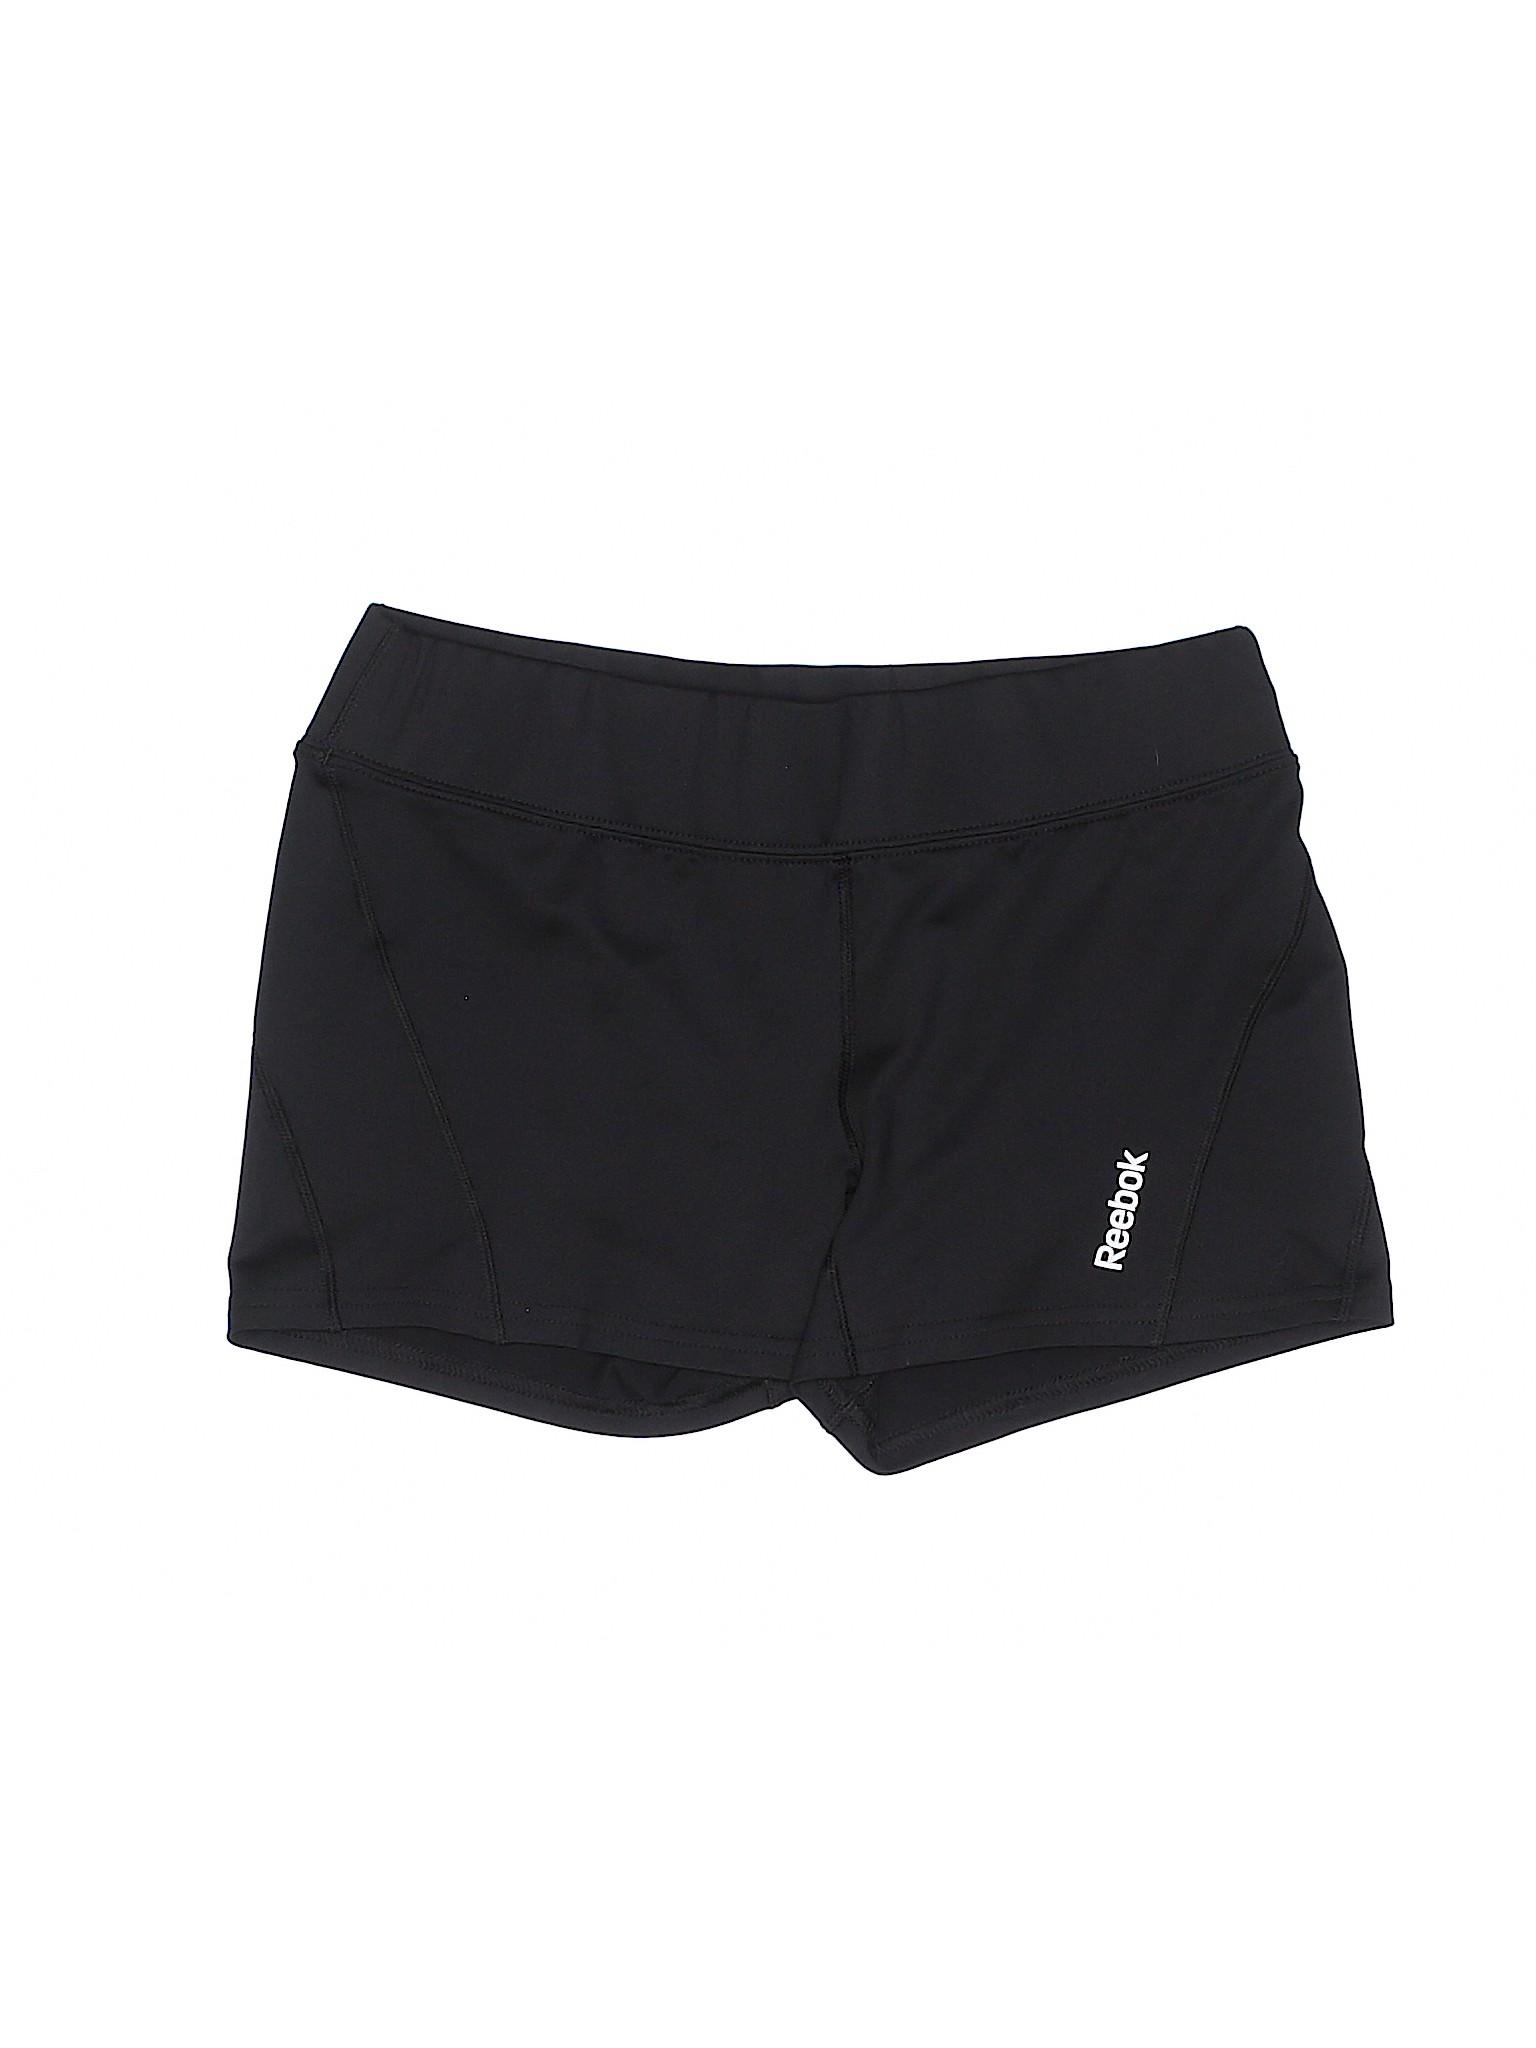 Athletic Boutique Shorts Reebok Reebok Boutique q1fwyav